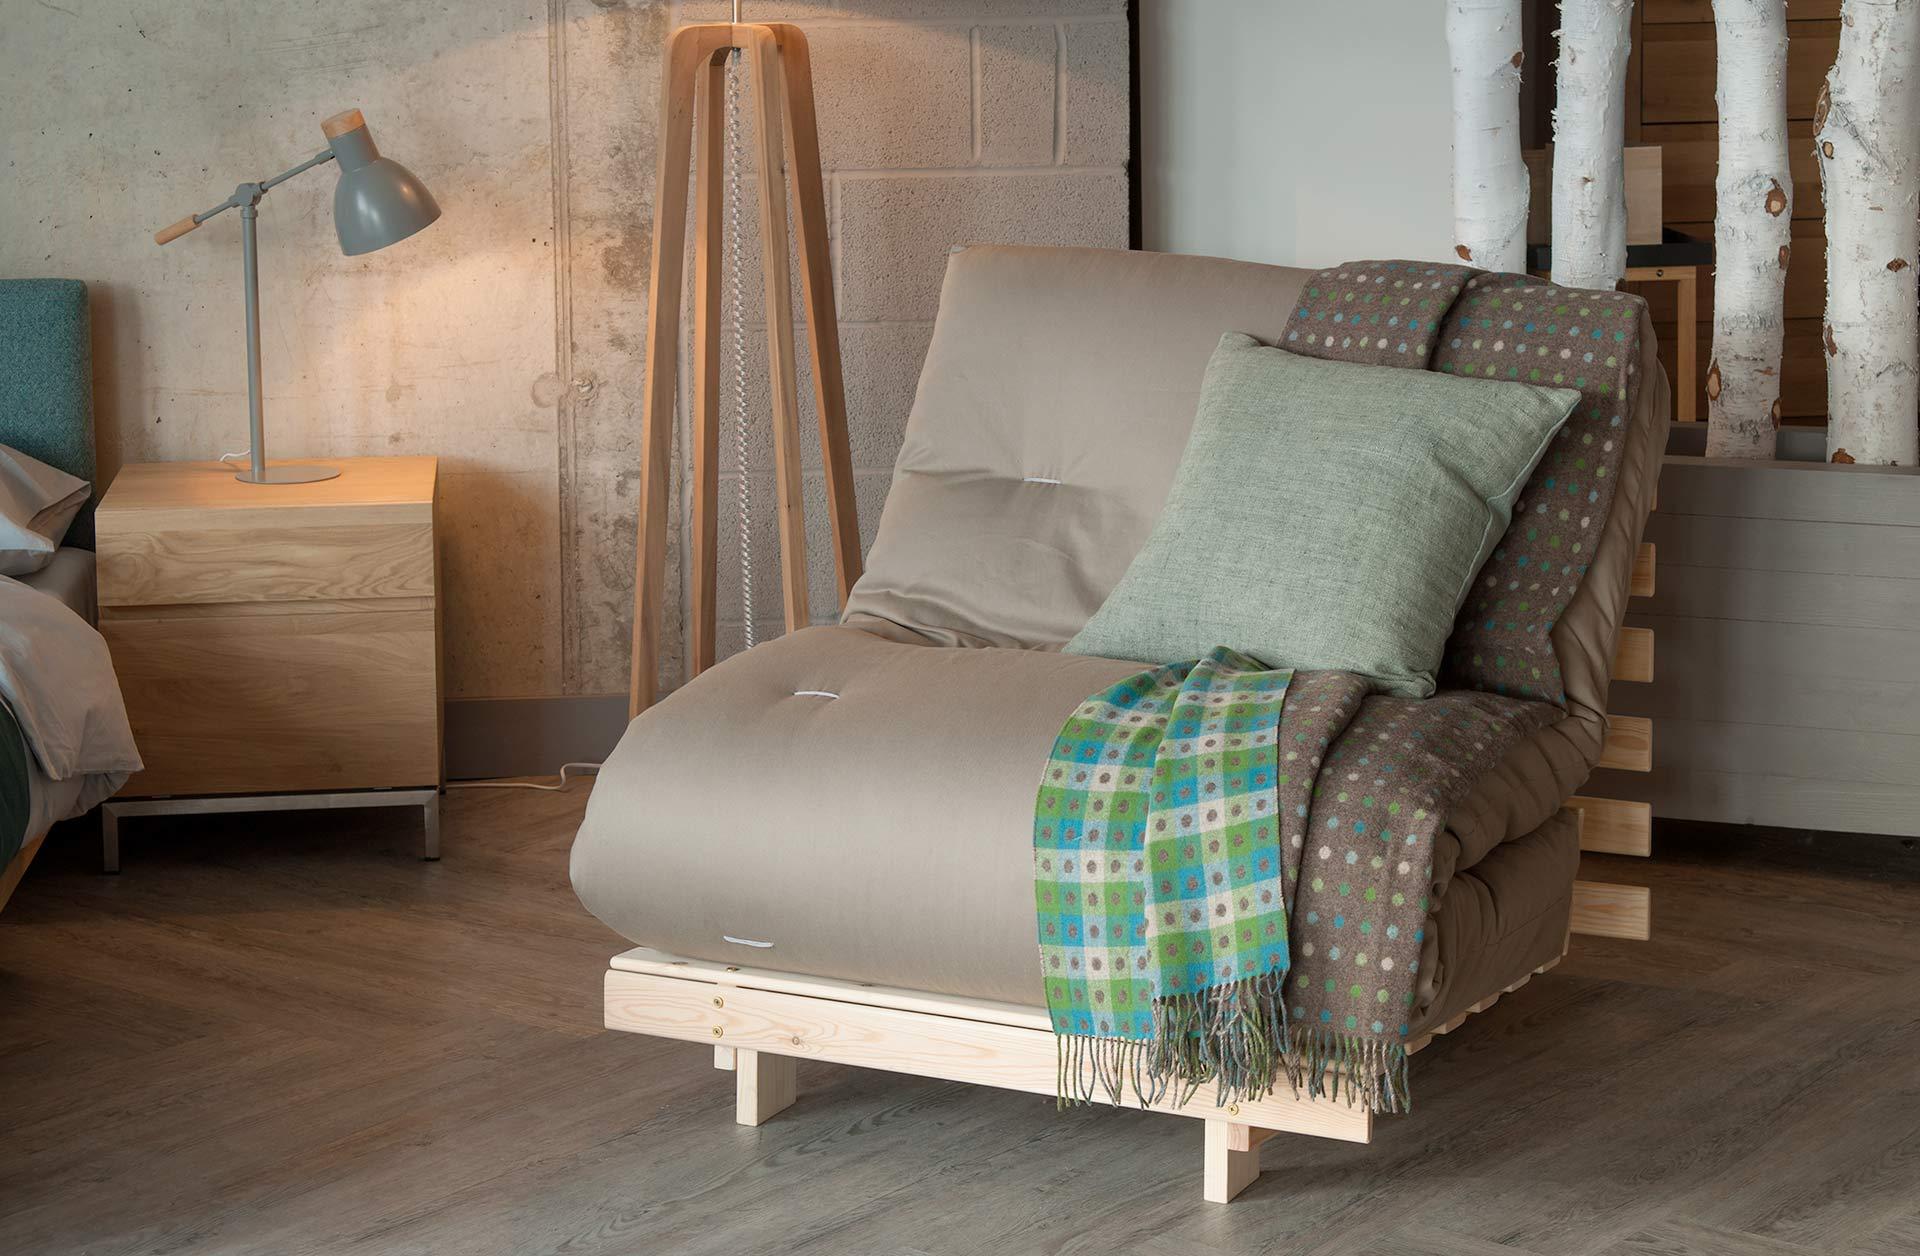 tokyo-sofa-bed-single-3q